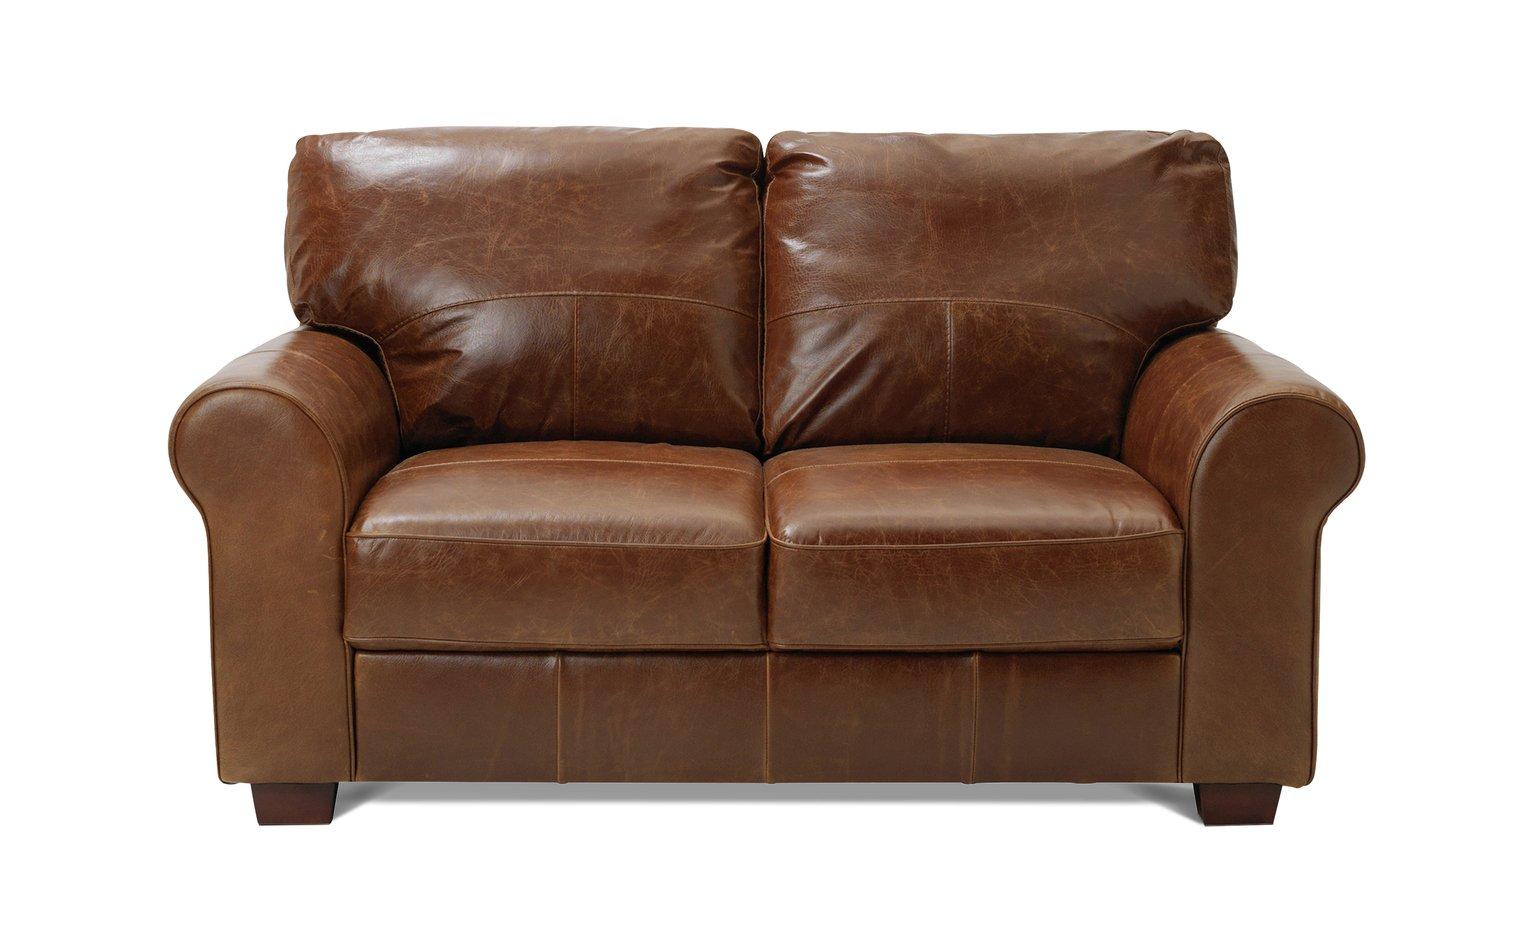 Argos Home Salisbury 2 Seater Leather Sofa   Tan